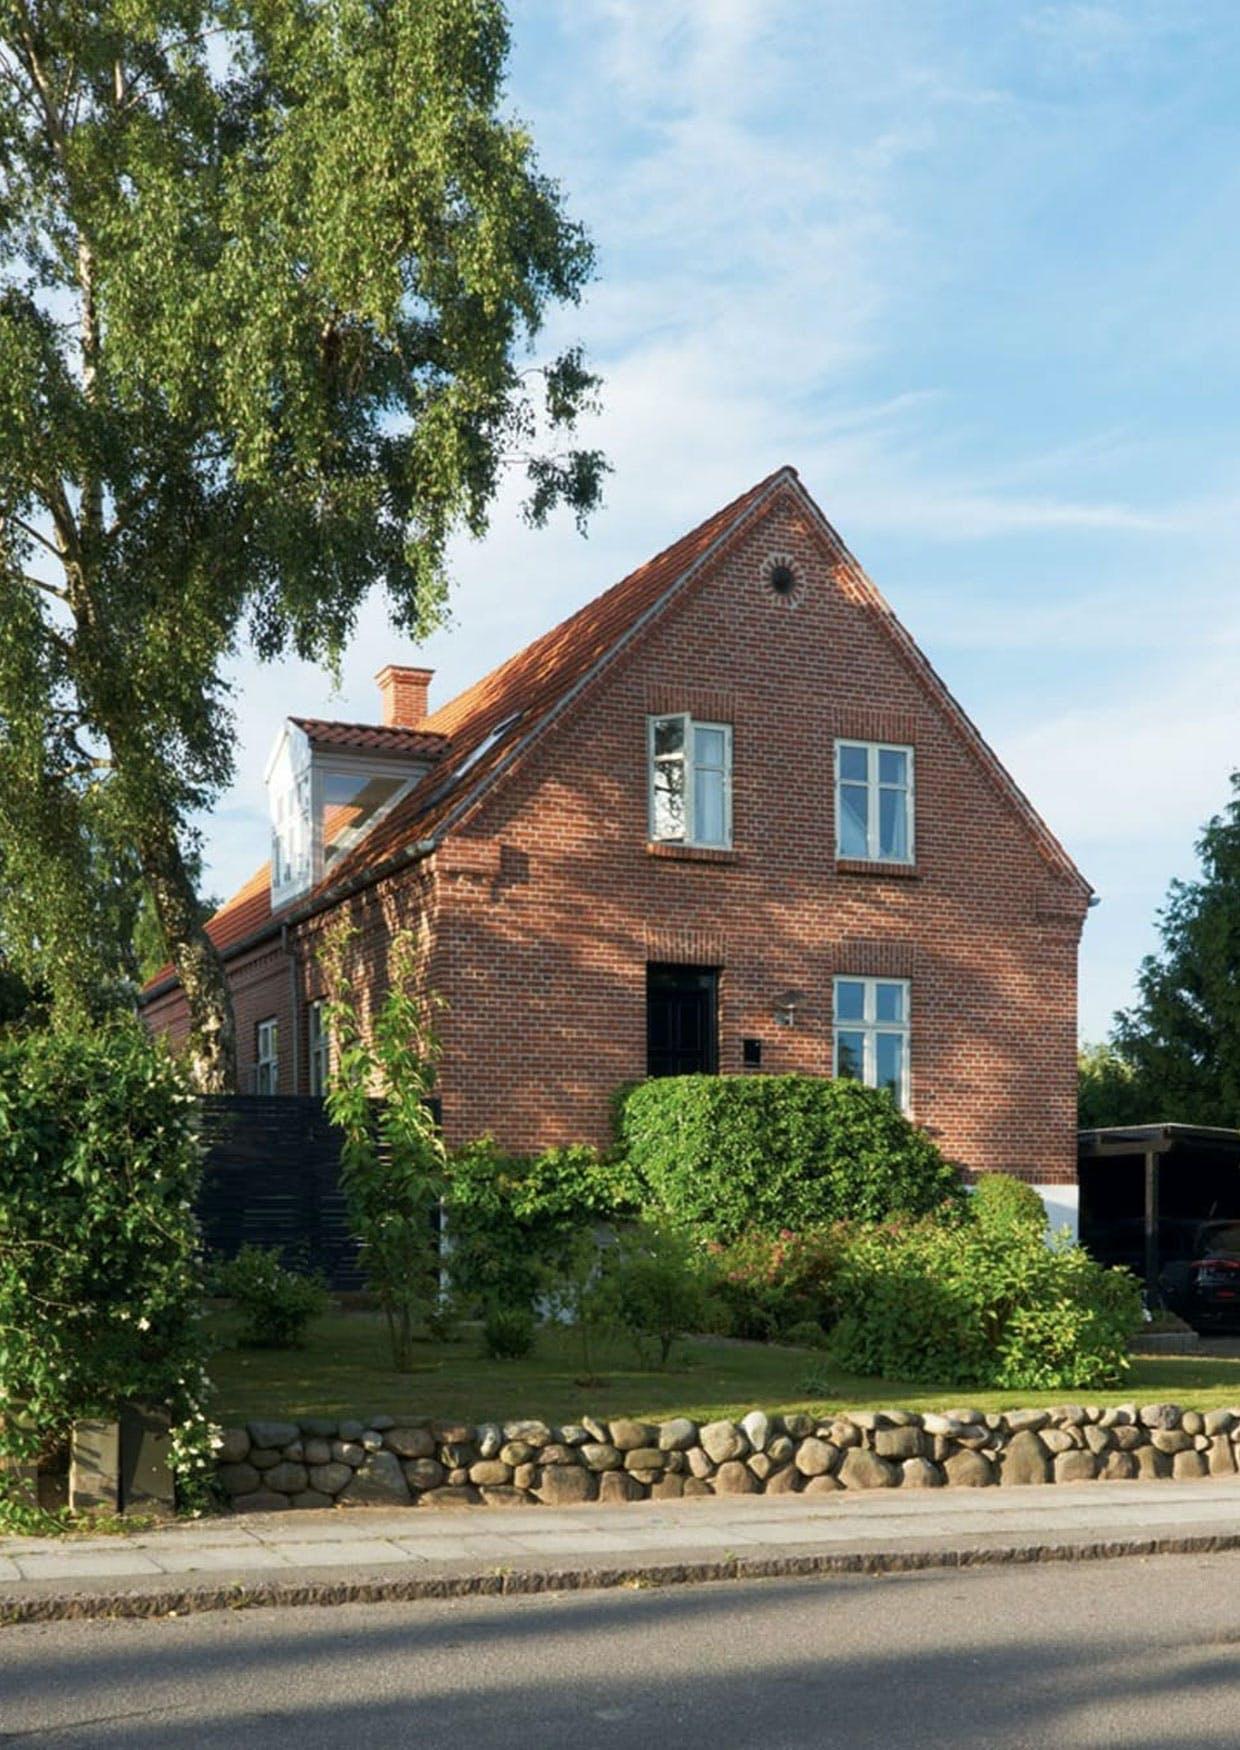 Murermestervilla fra 1926 på 189 kvadratmeter i Århus-forstaden Fredensvang - denne dog uden halvvalmet tag.